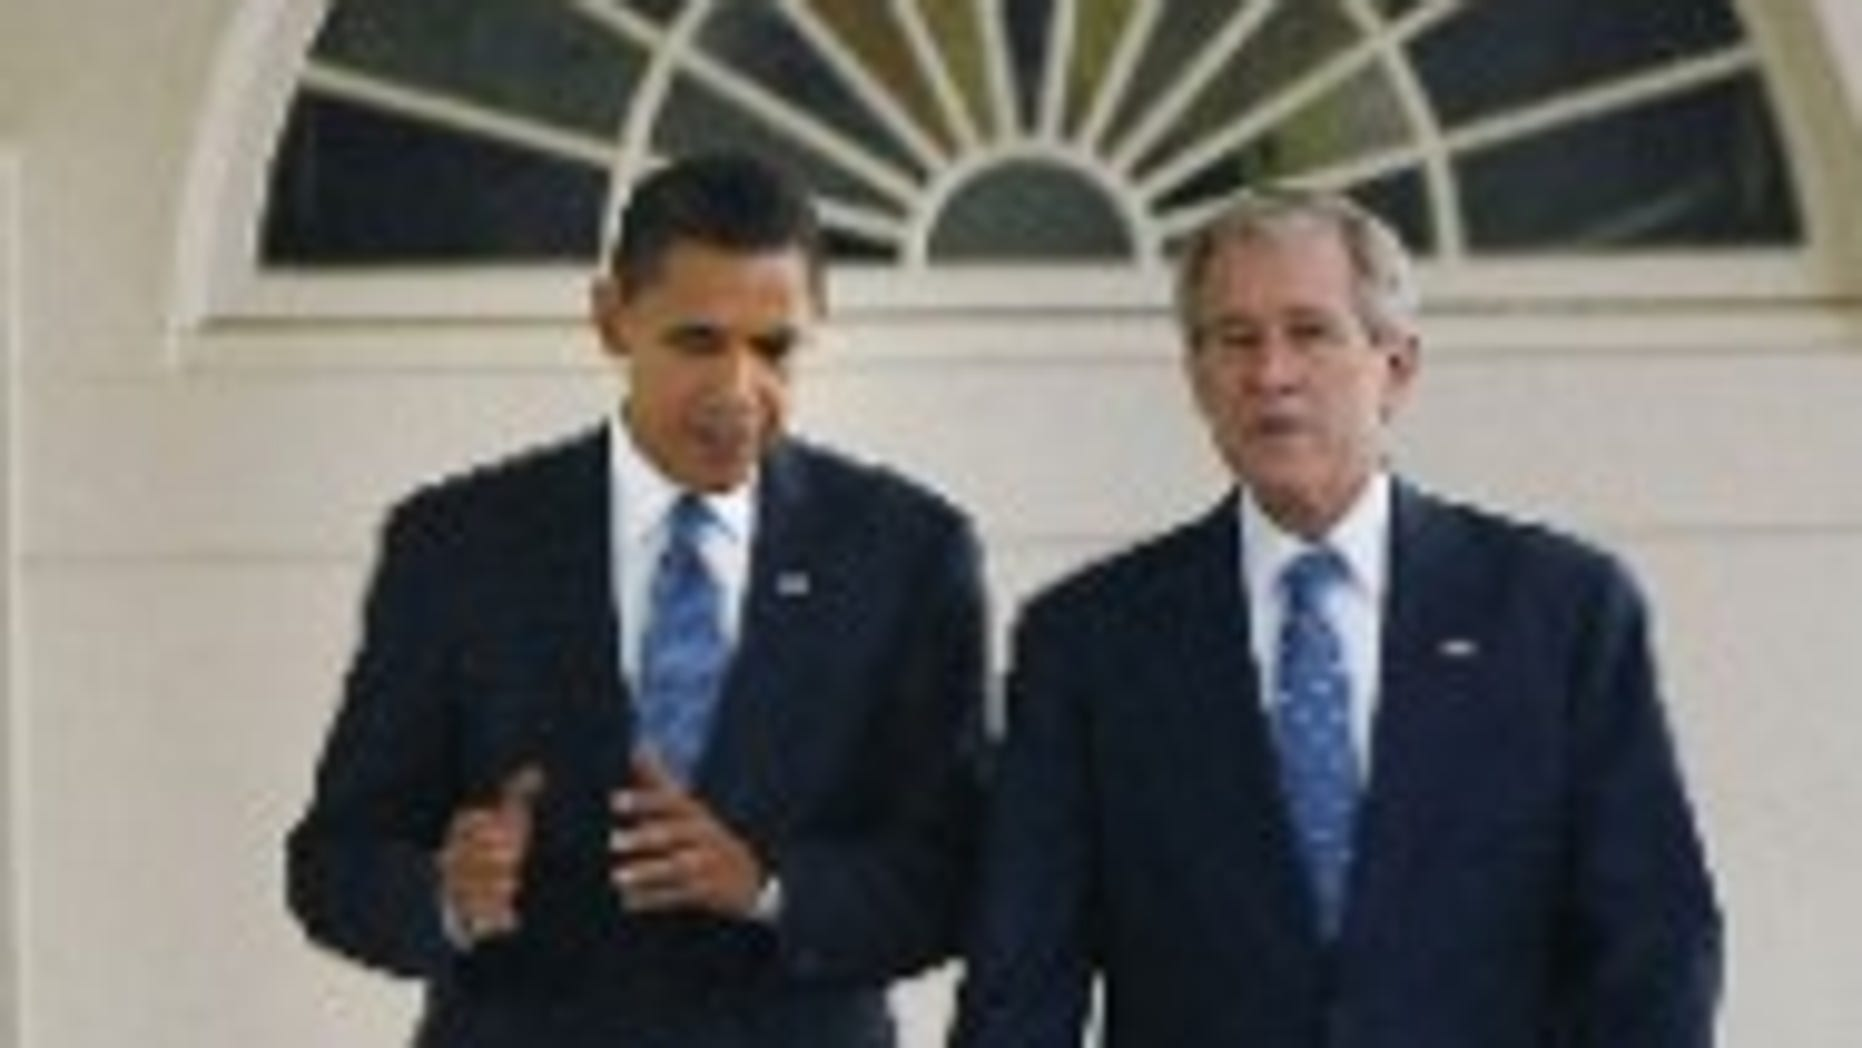 President Bush and President-elect Obama meet at the White House. November 10, 2008 (AP Photo)